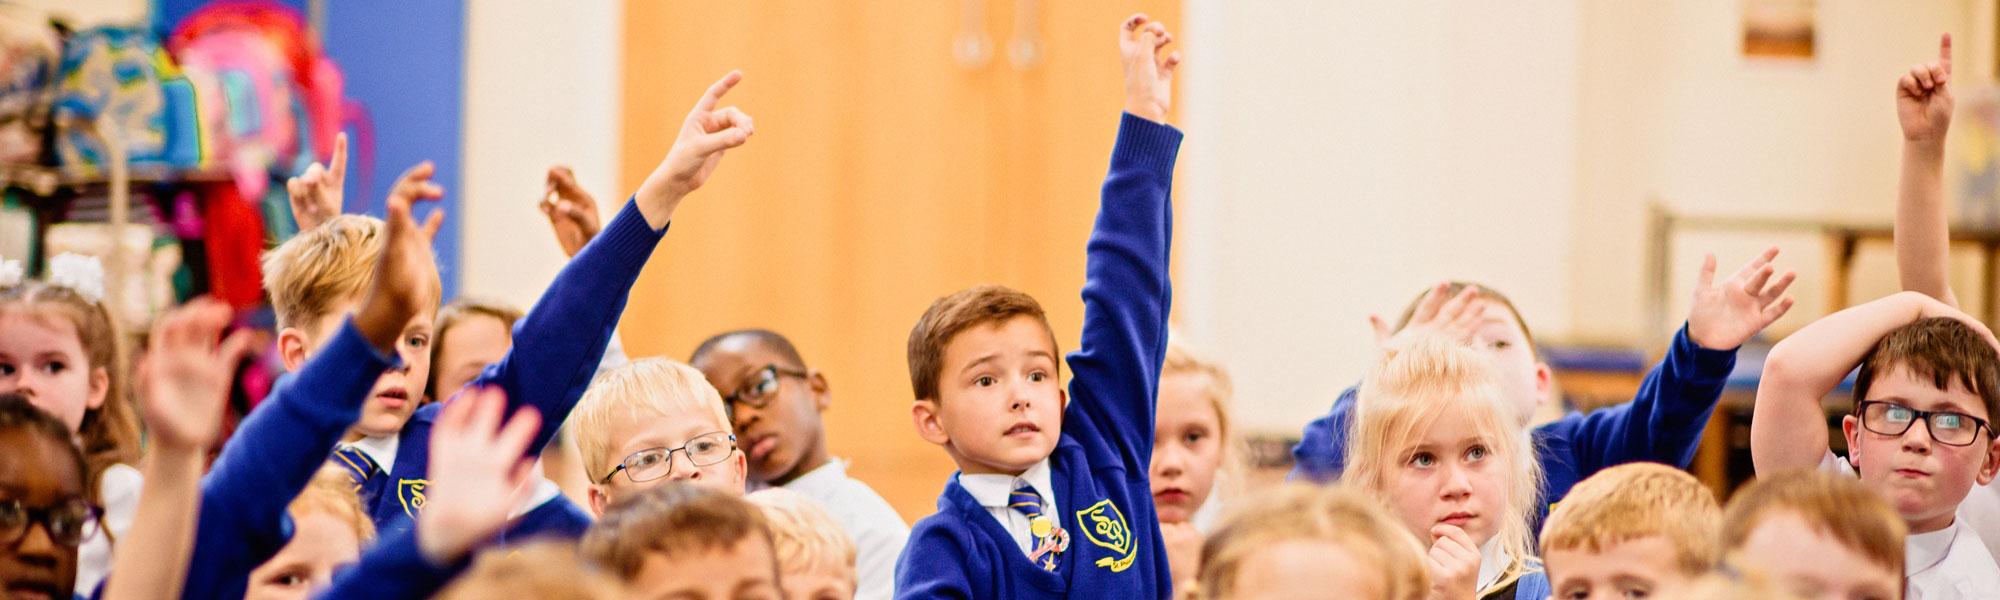 St. Philip's RC Primary School